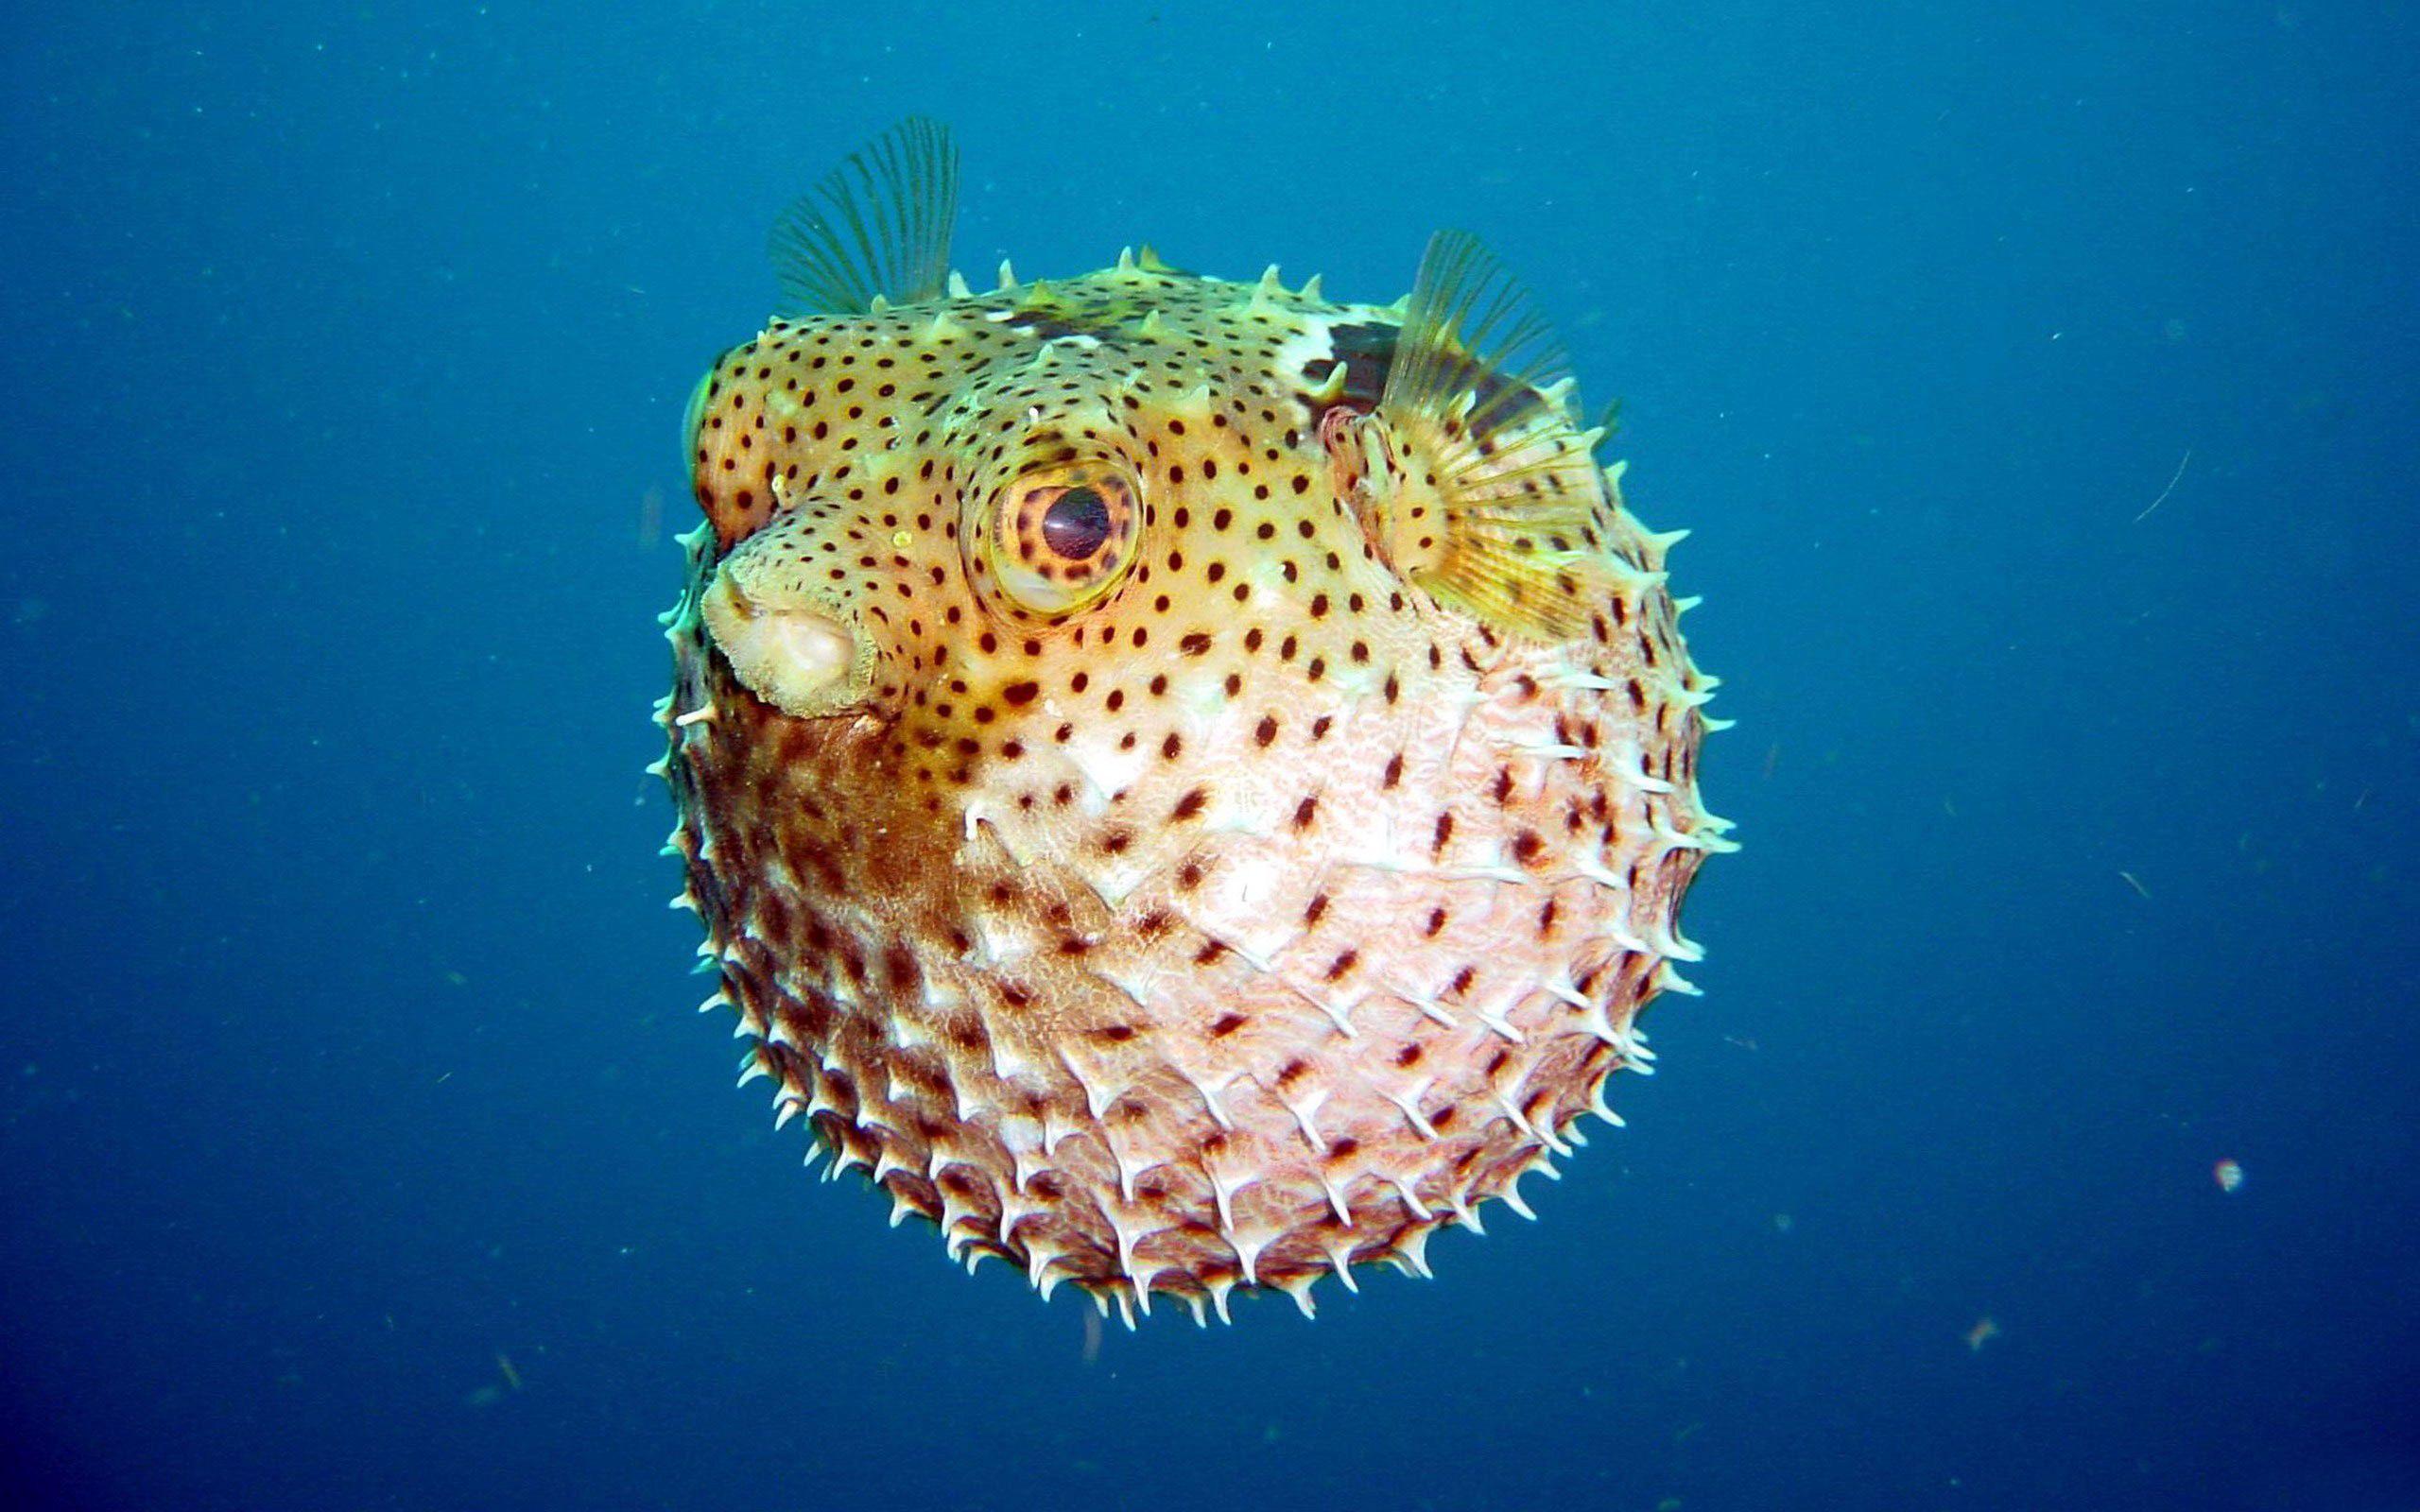 fondos pantalla pez globo hd - Buscar con Google   Pez Globo ...